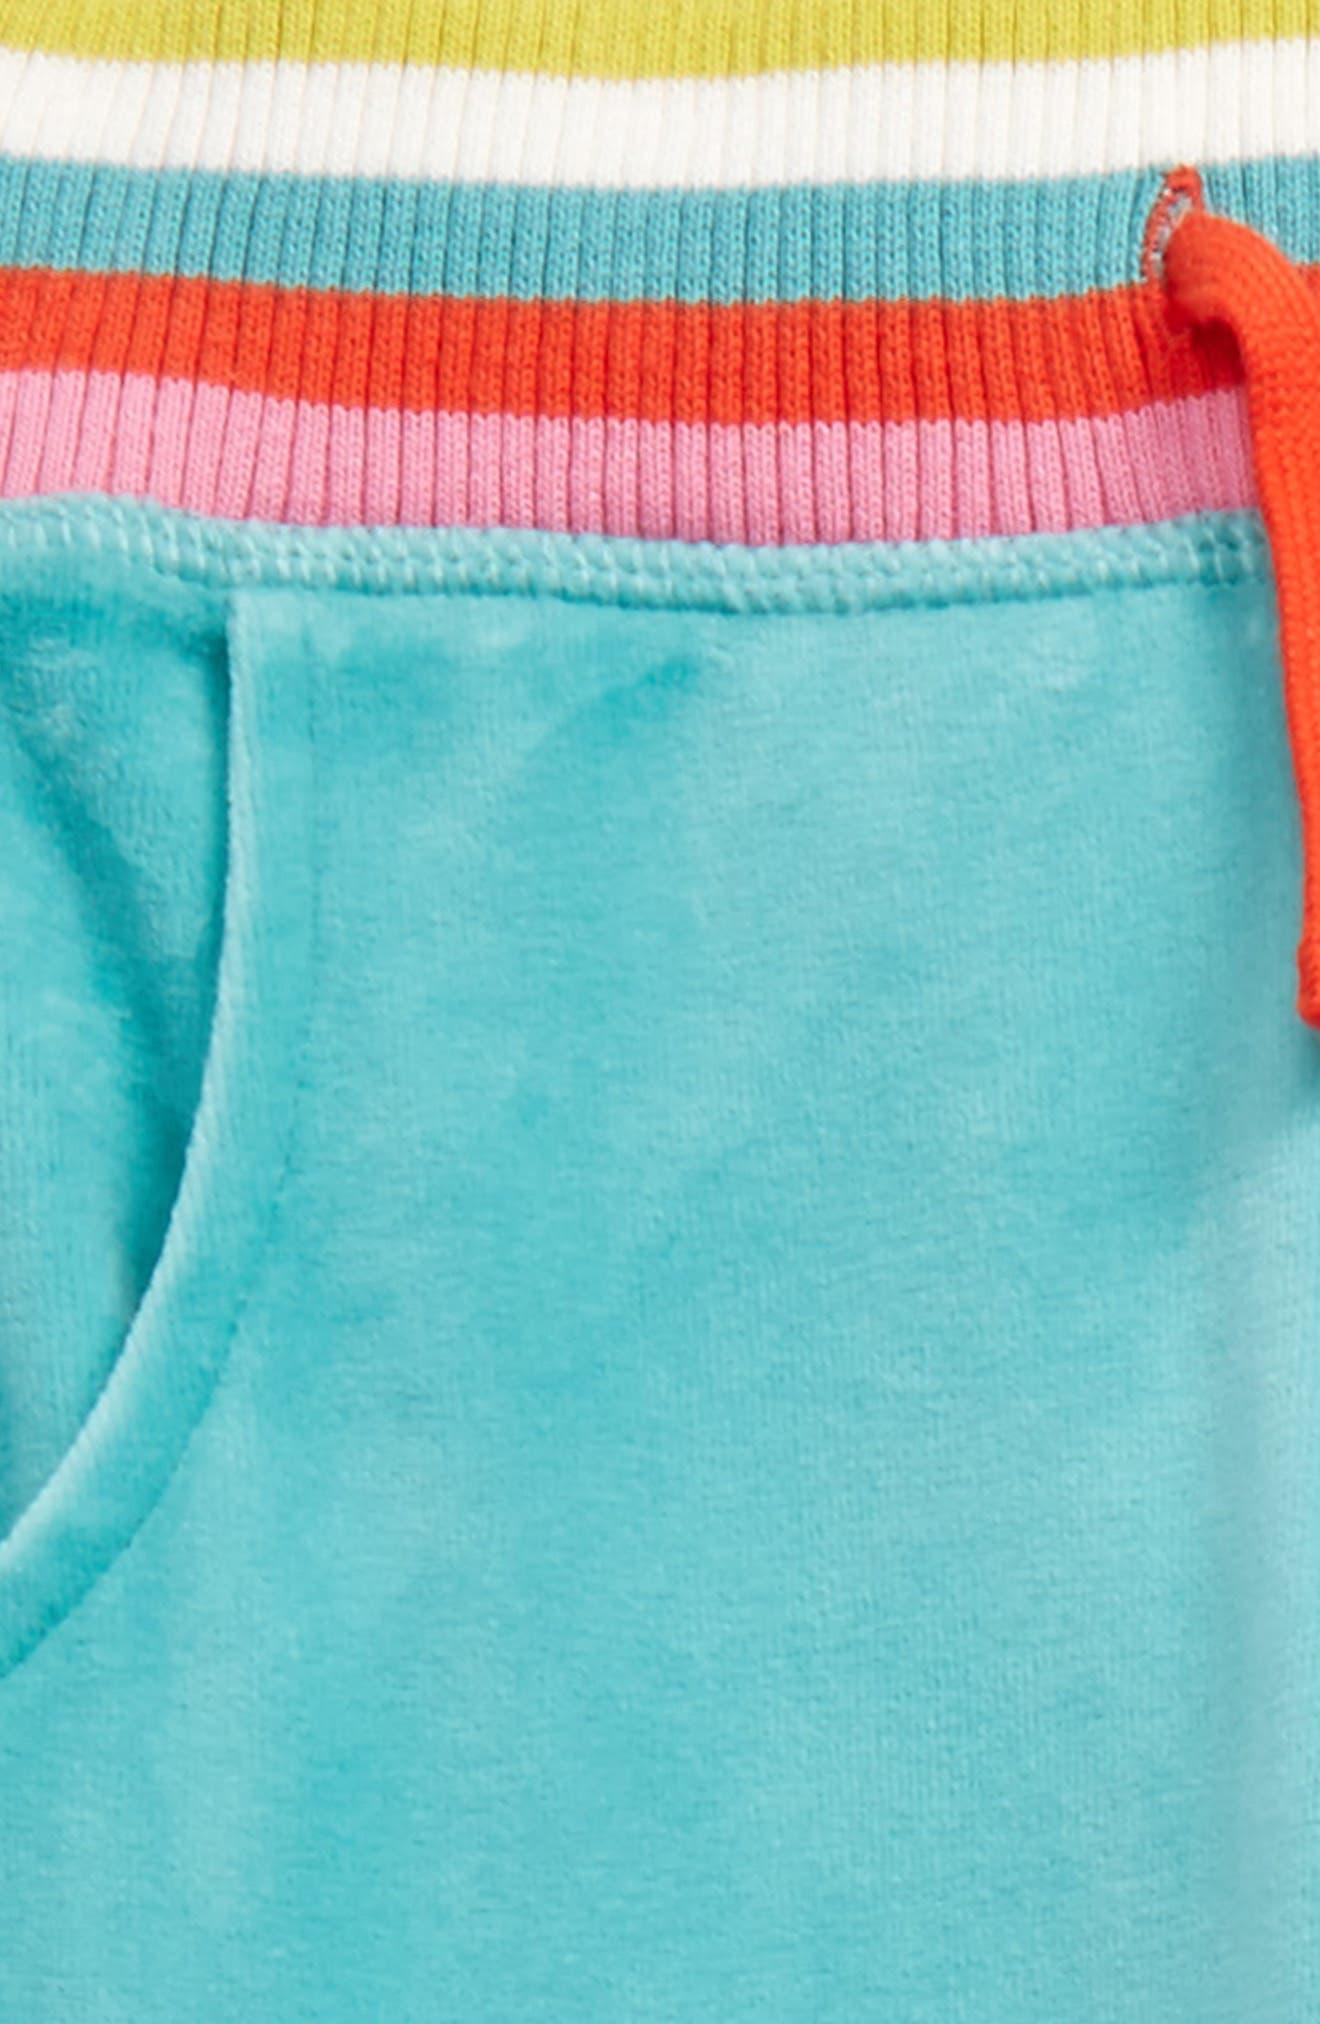 Velour Sweatpants,                             Alternate thumbnail 2, color,                             Green Duck